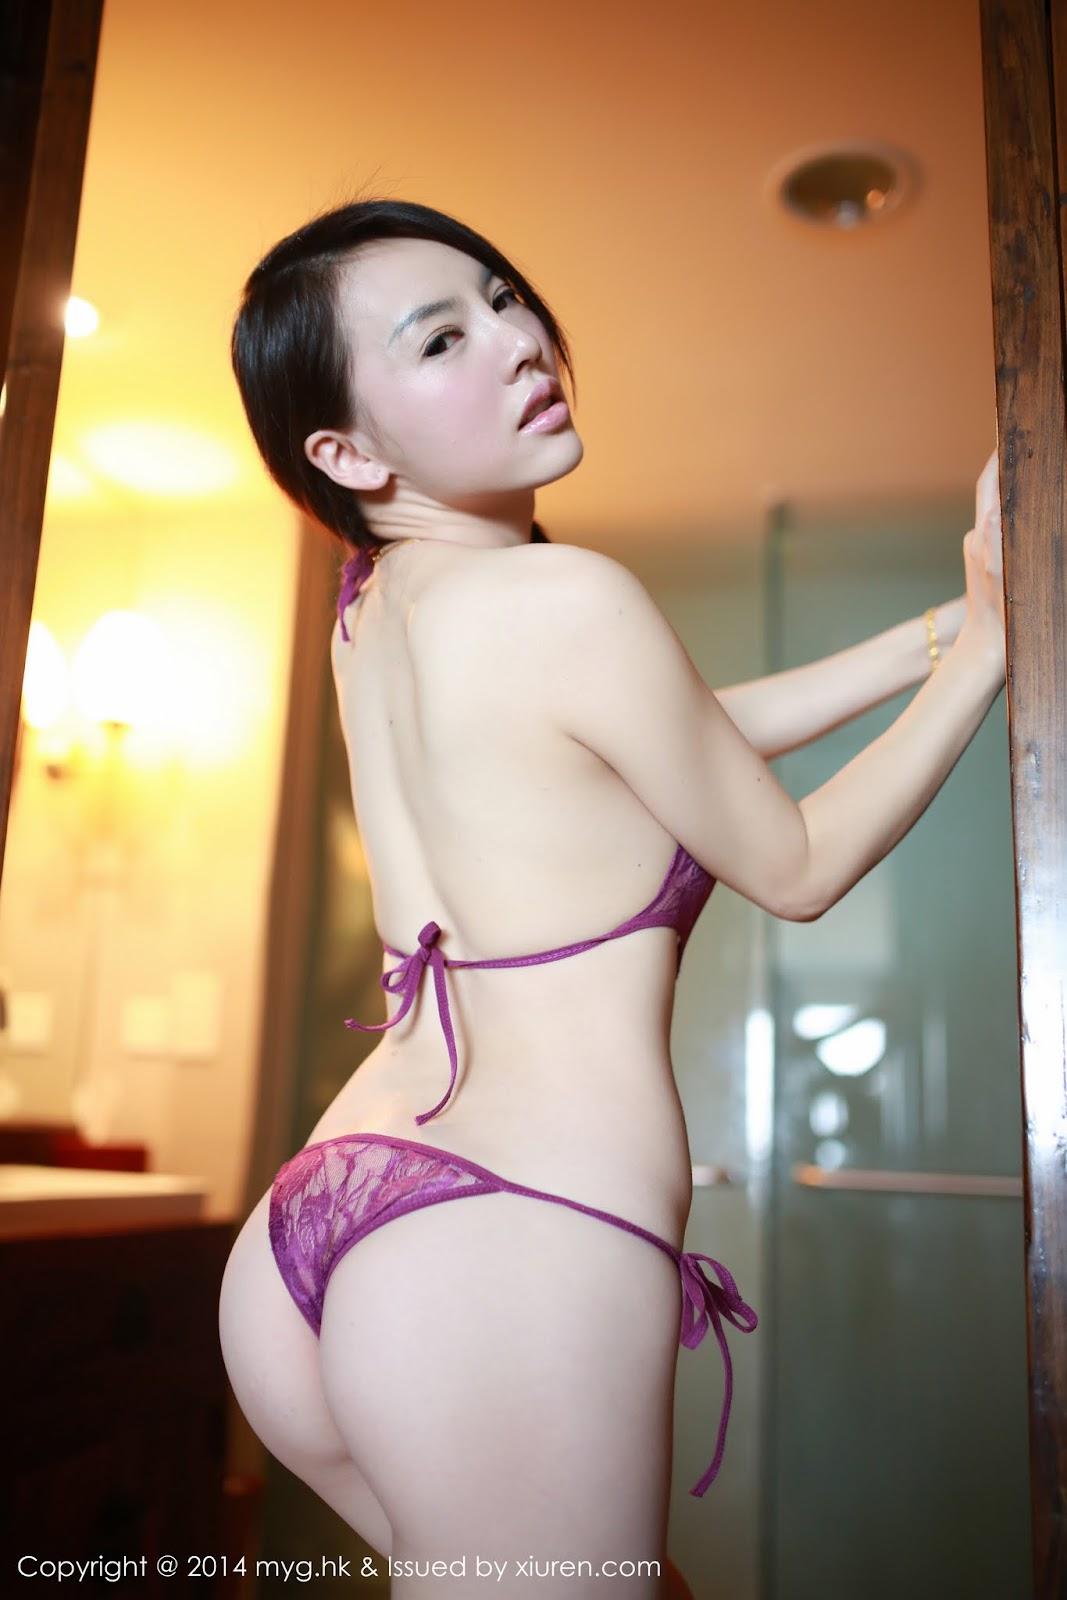 20032 012 - MYGIRL VOL.30 Photo Nude Hot Sexy